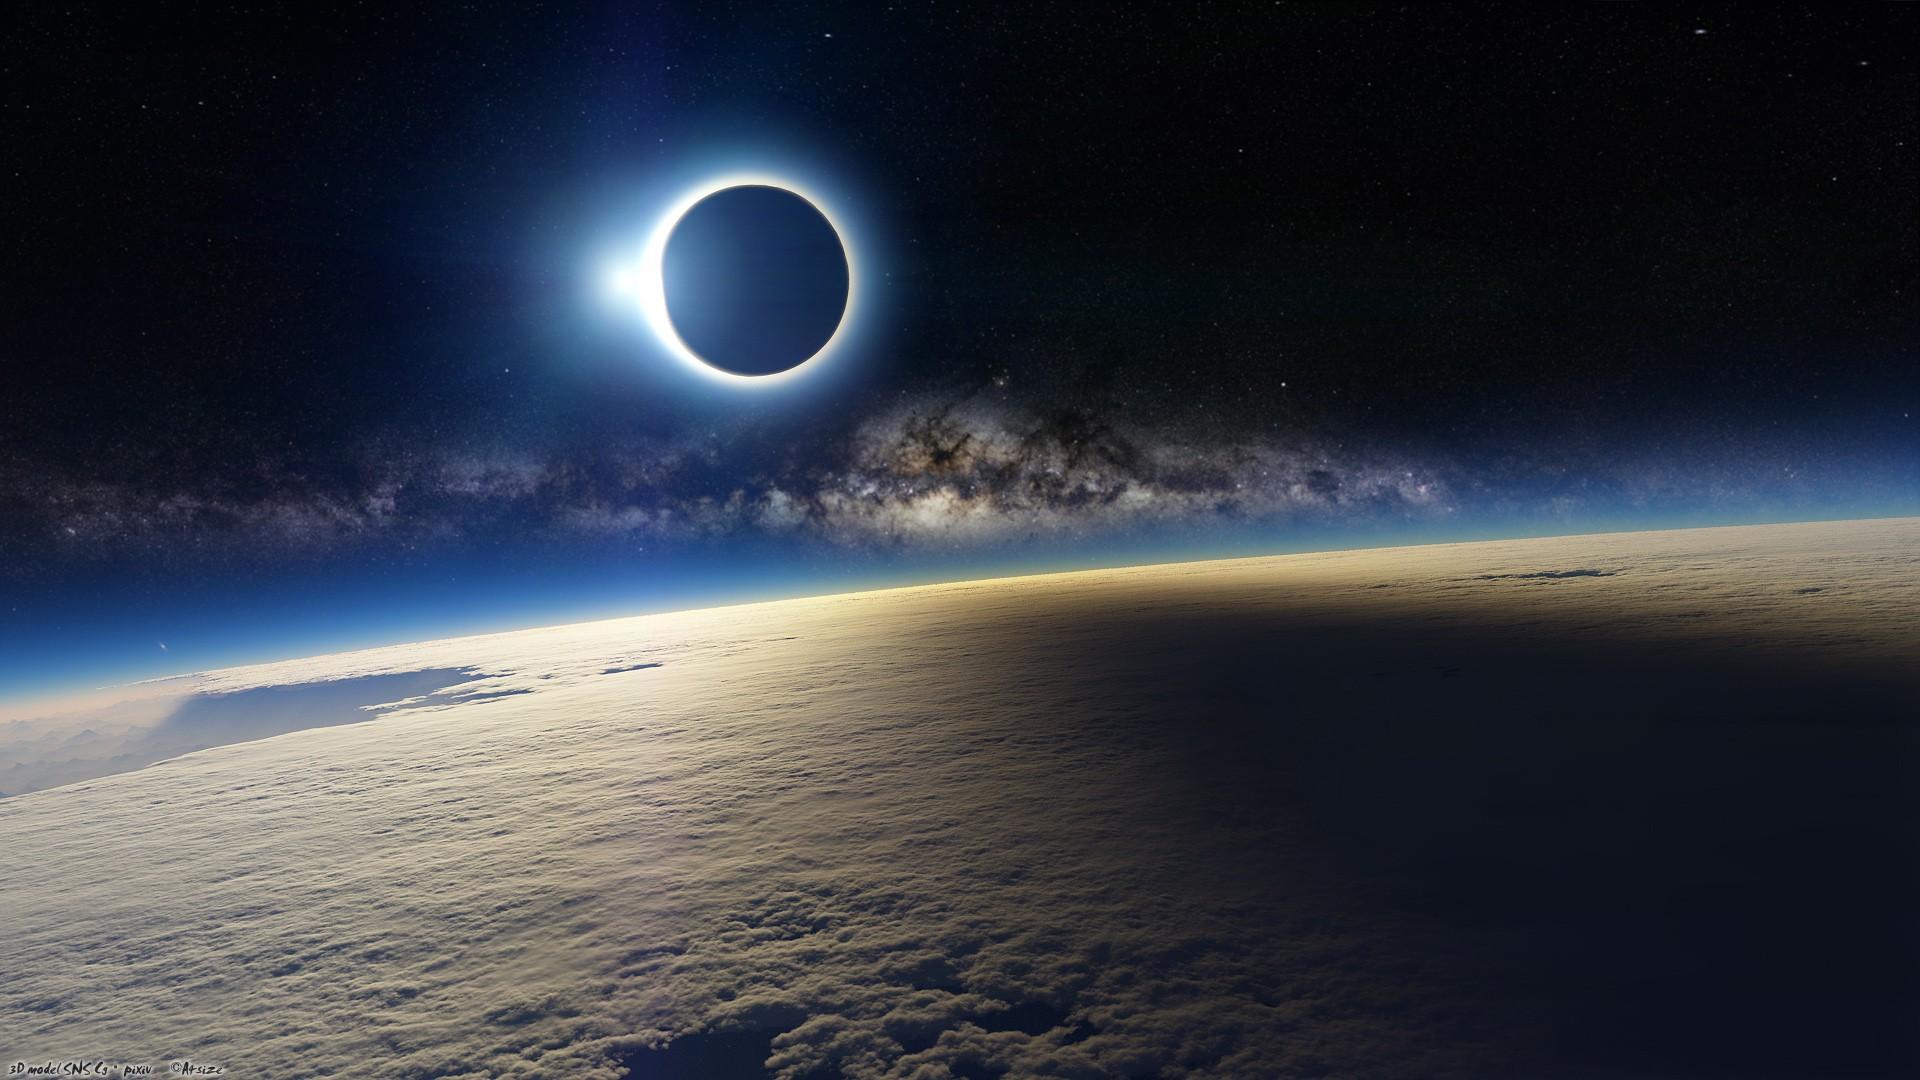 https://i0.wp.com/www.zastavki.com/pictures/originals/2013/Space___Eclipse_of_the_sun_041429_.jpg